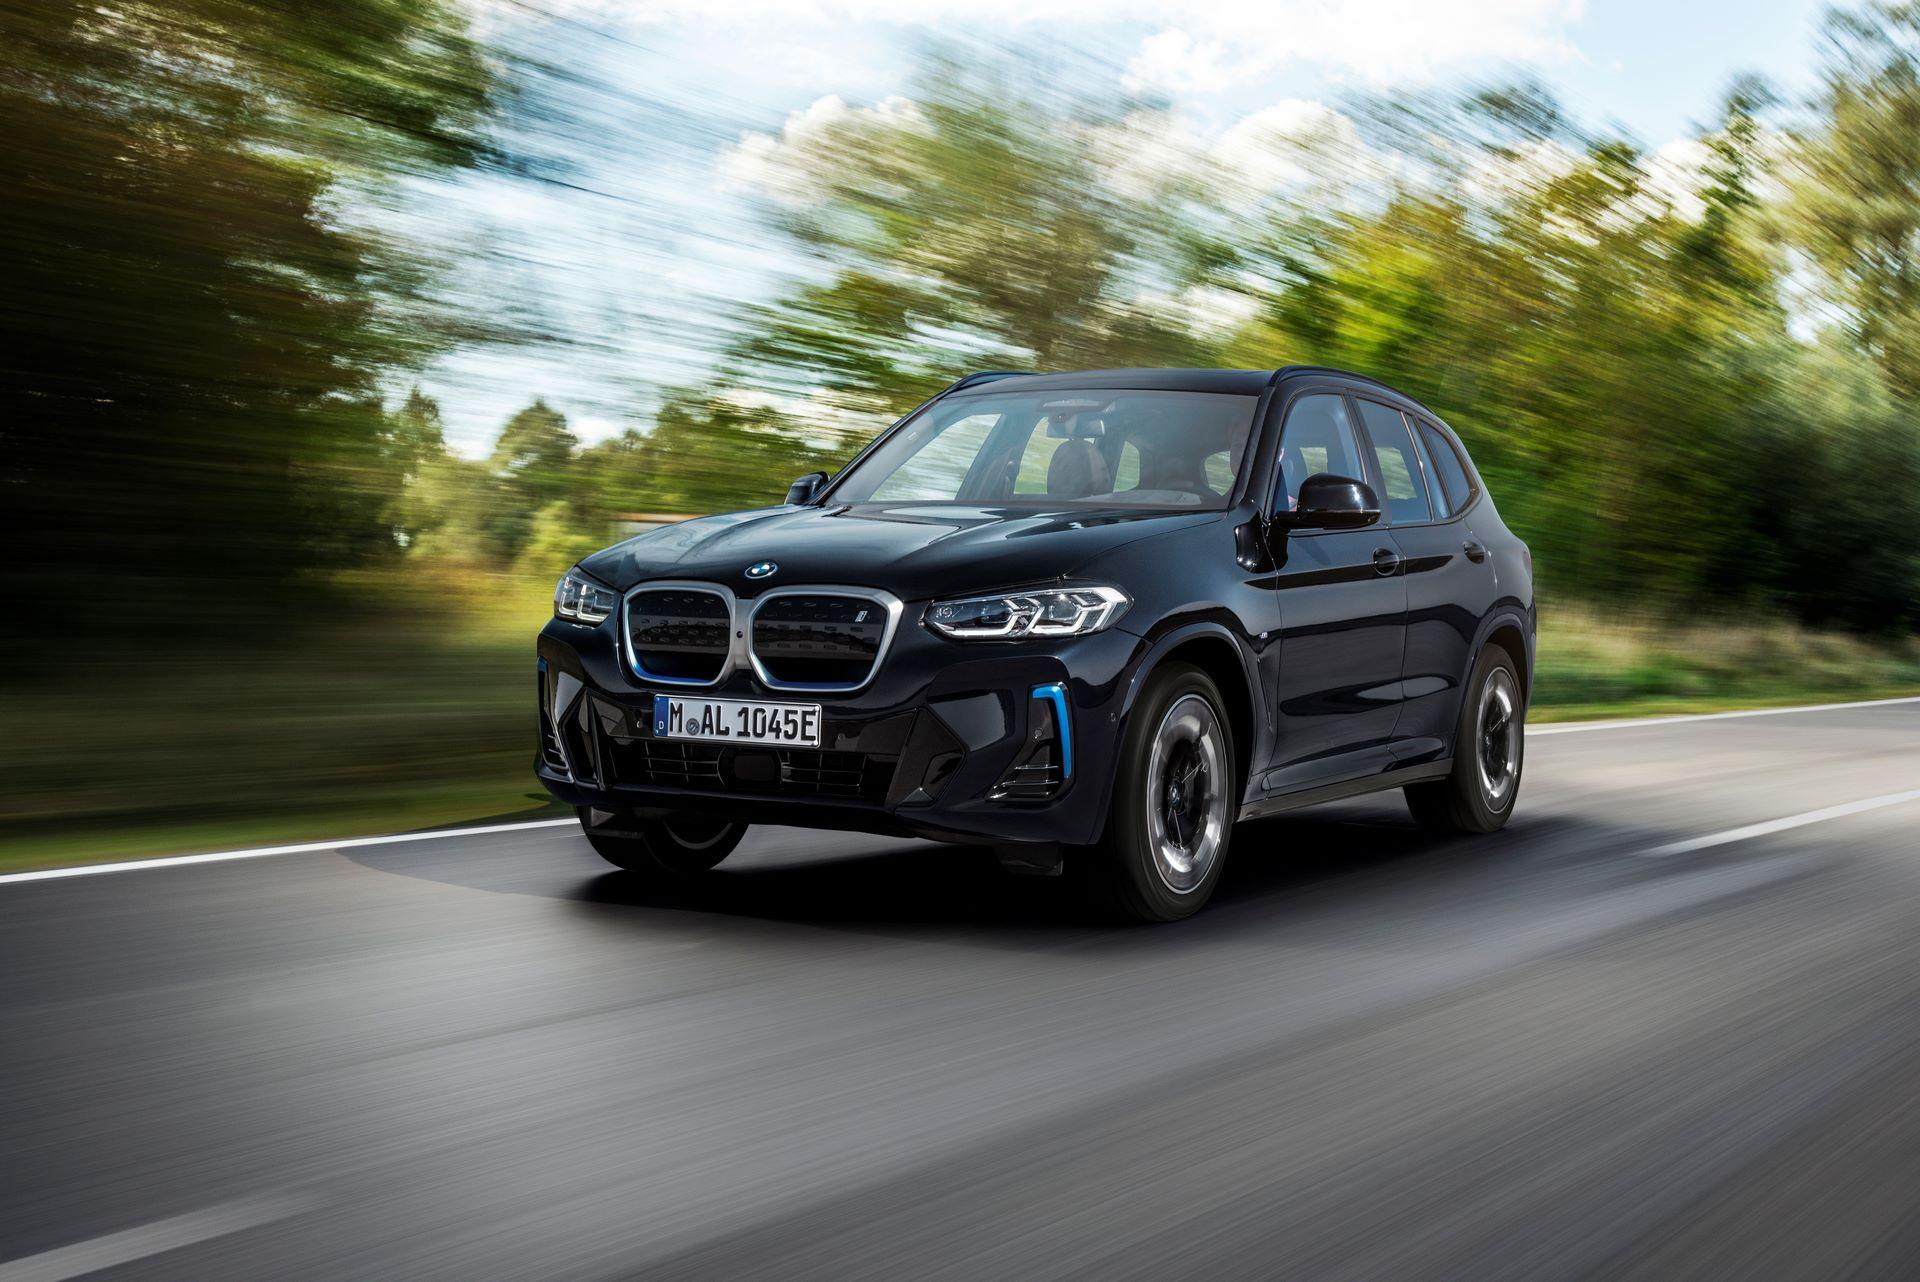 BMW-iX3-facelift-14